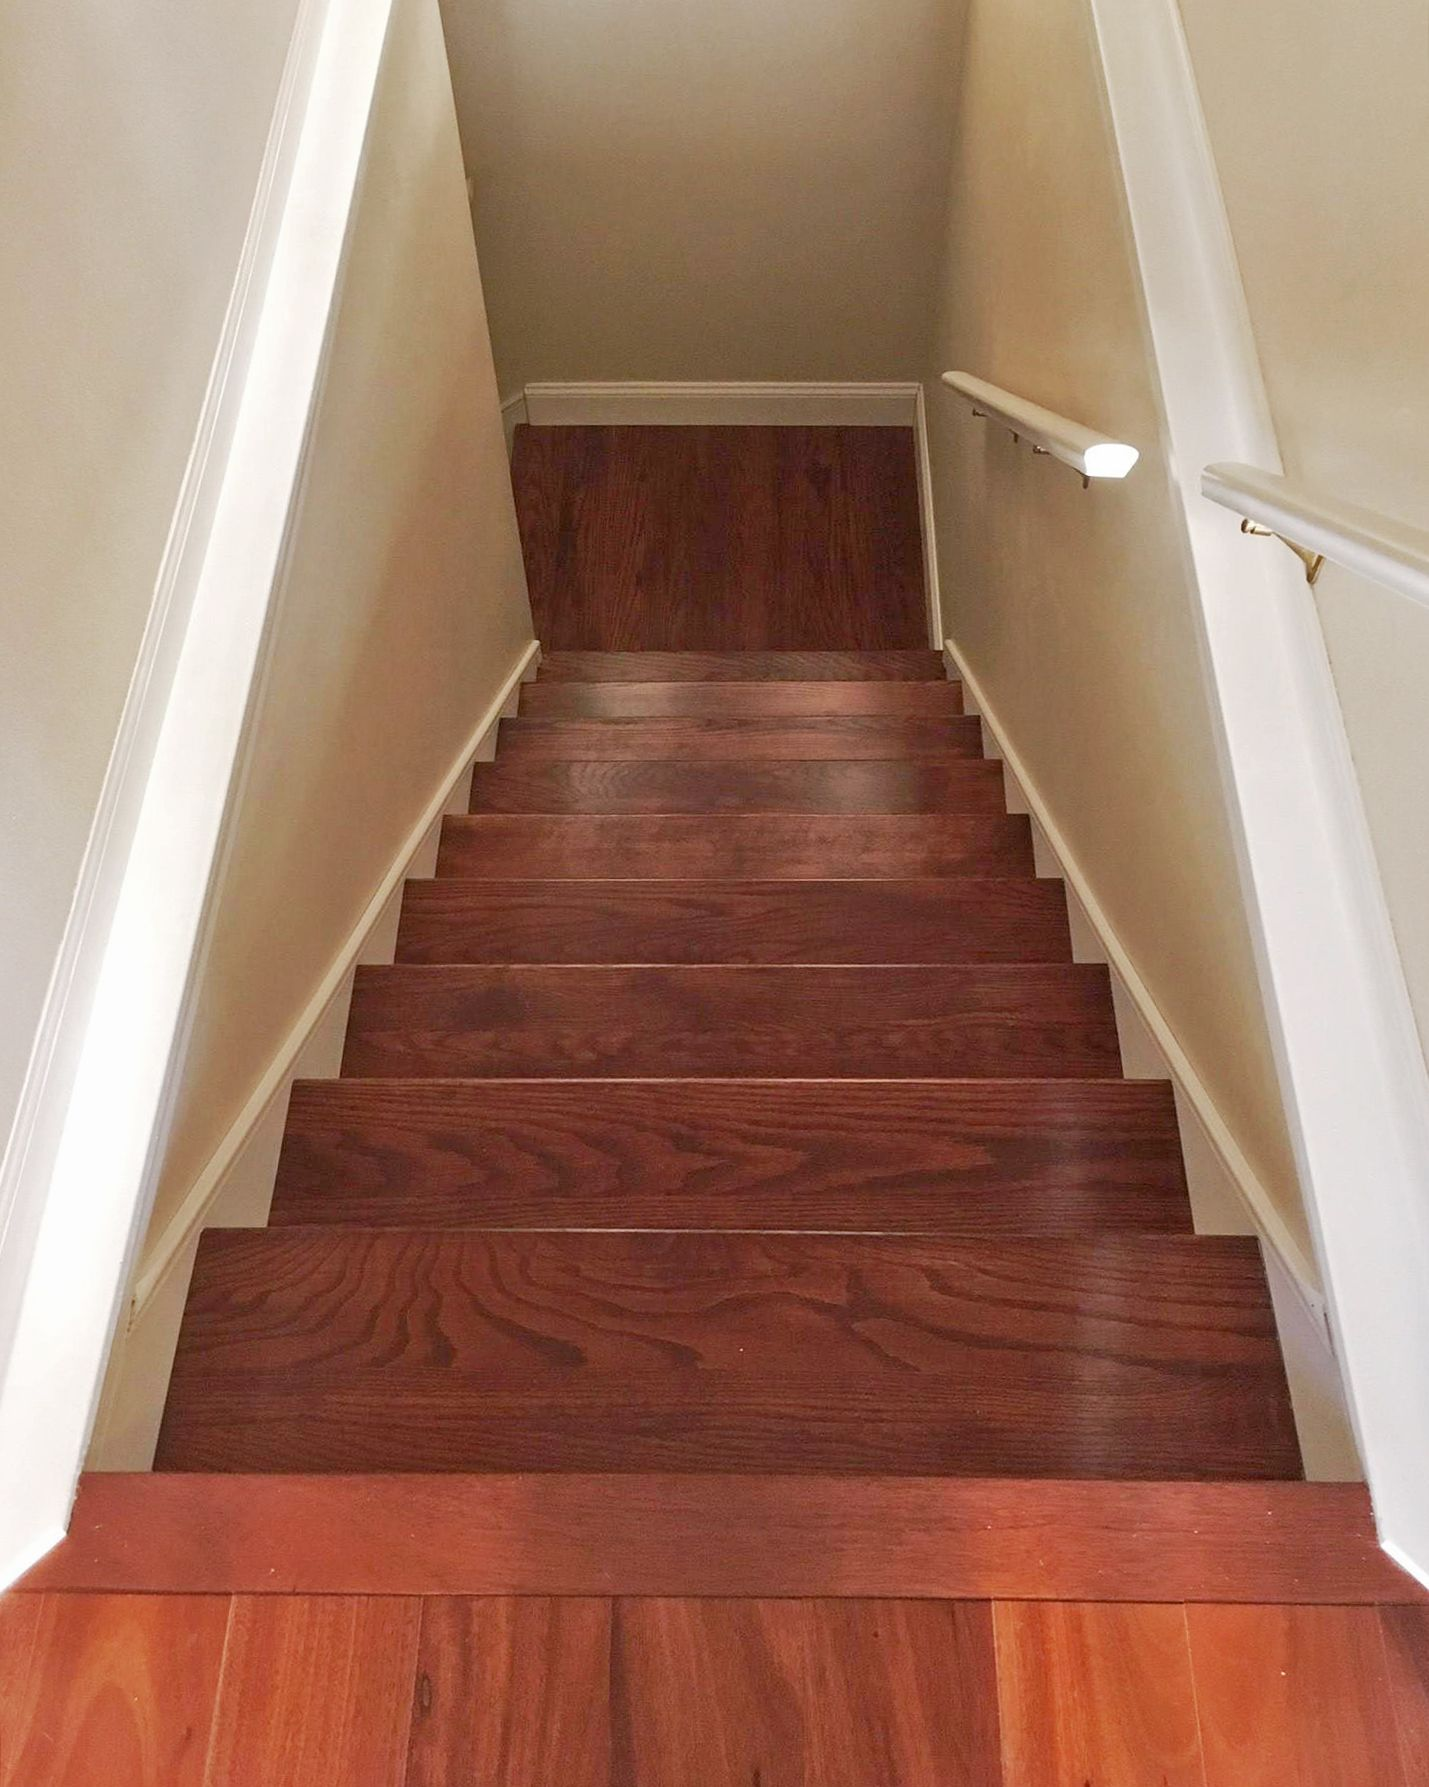 Best Red Oak Stair Tread In 2020 Oak Stairs Red Oak Wood Stairs 640 x 480